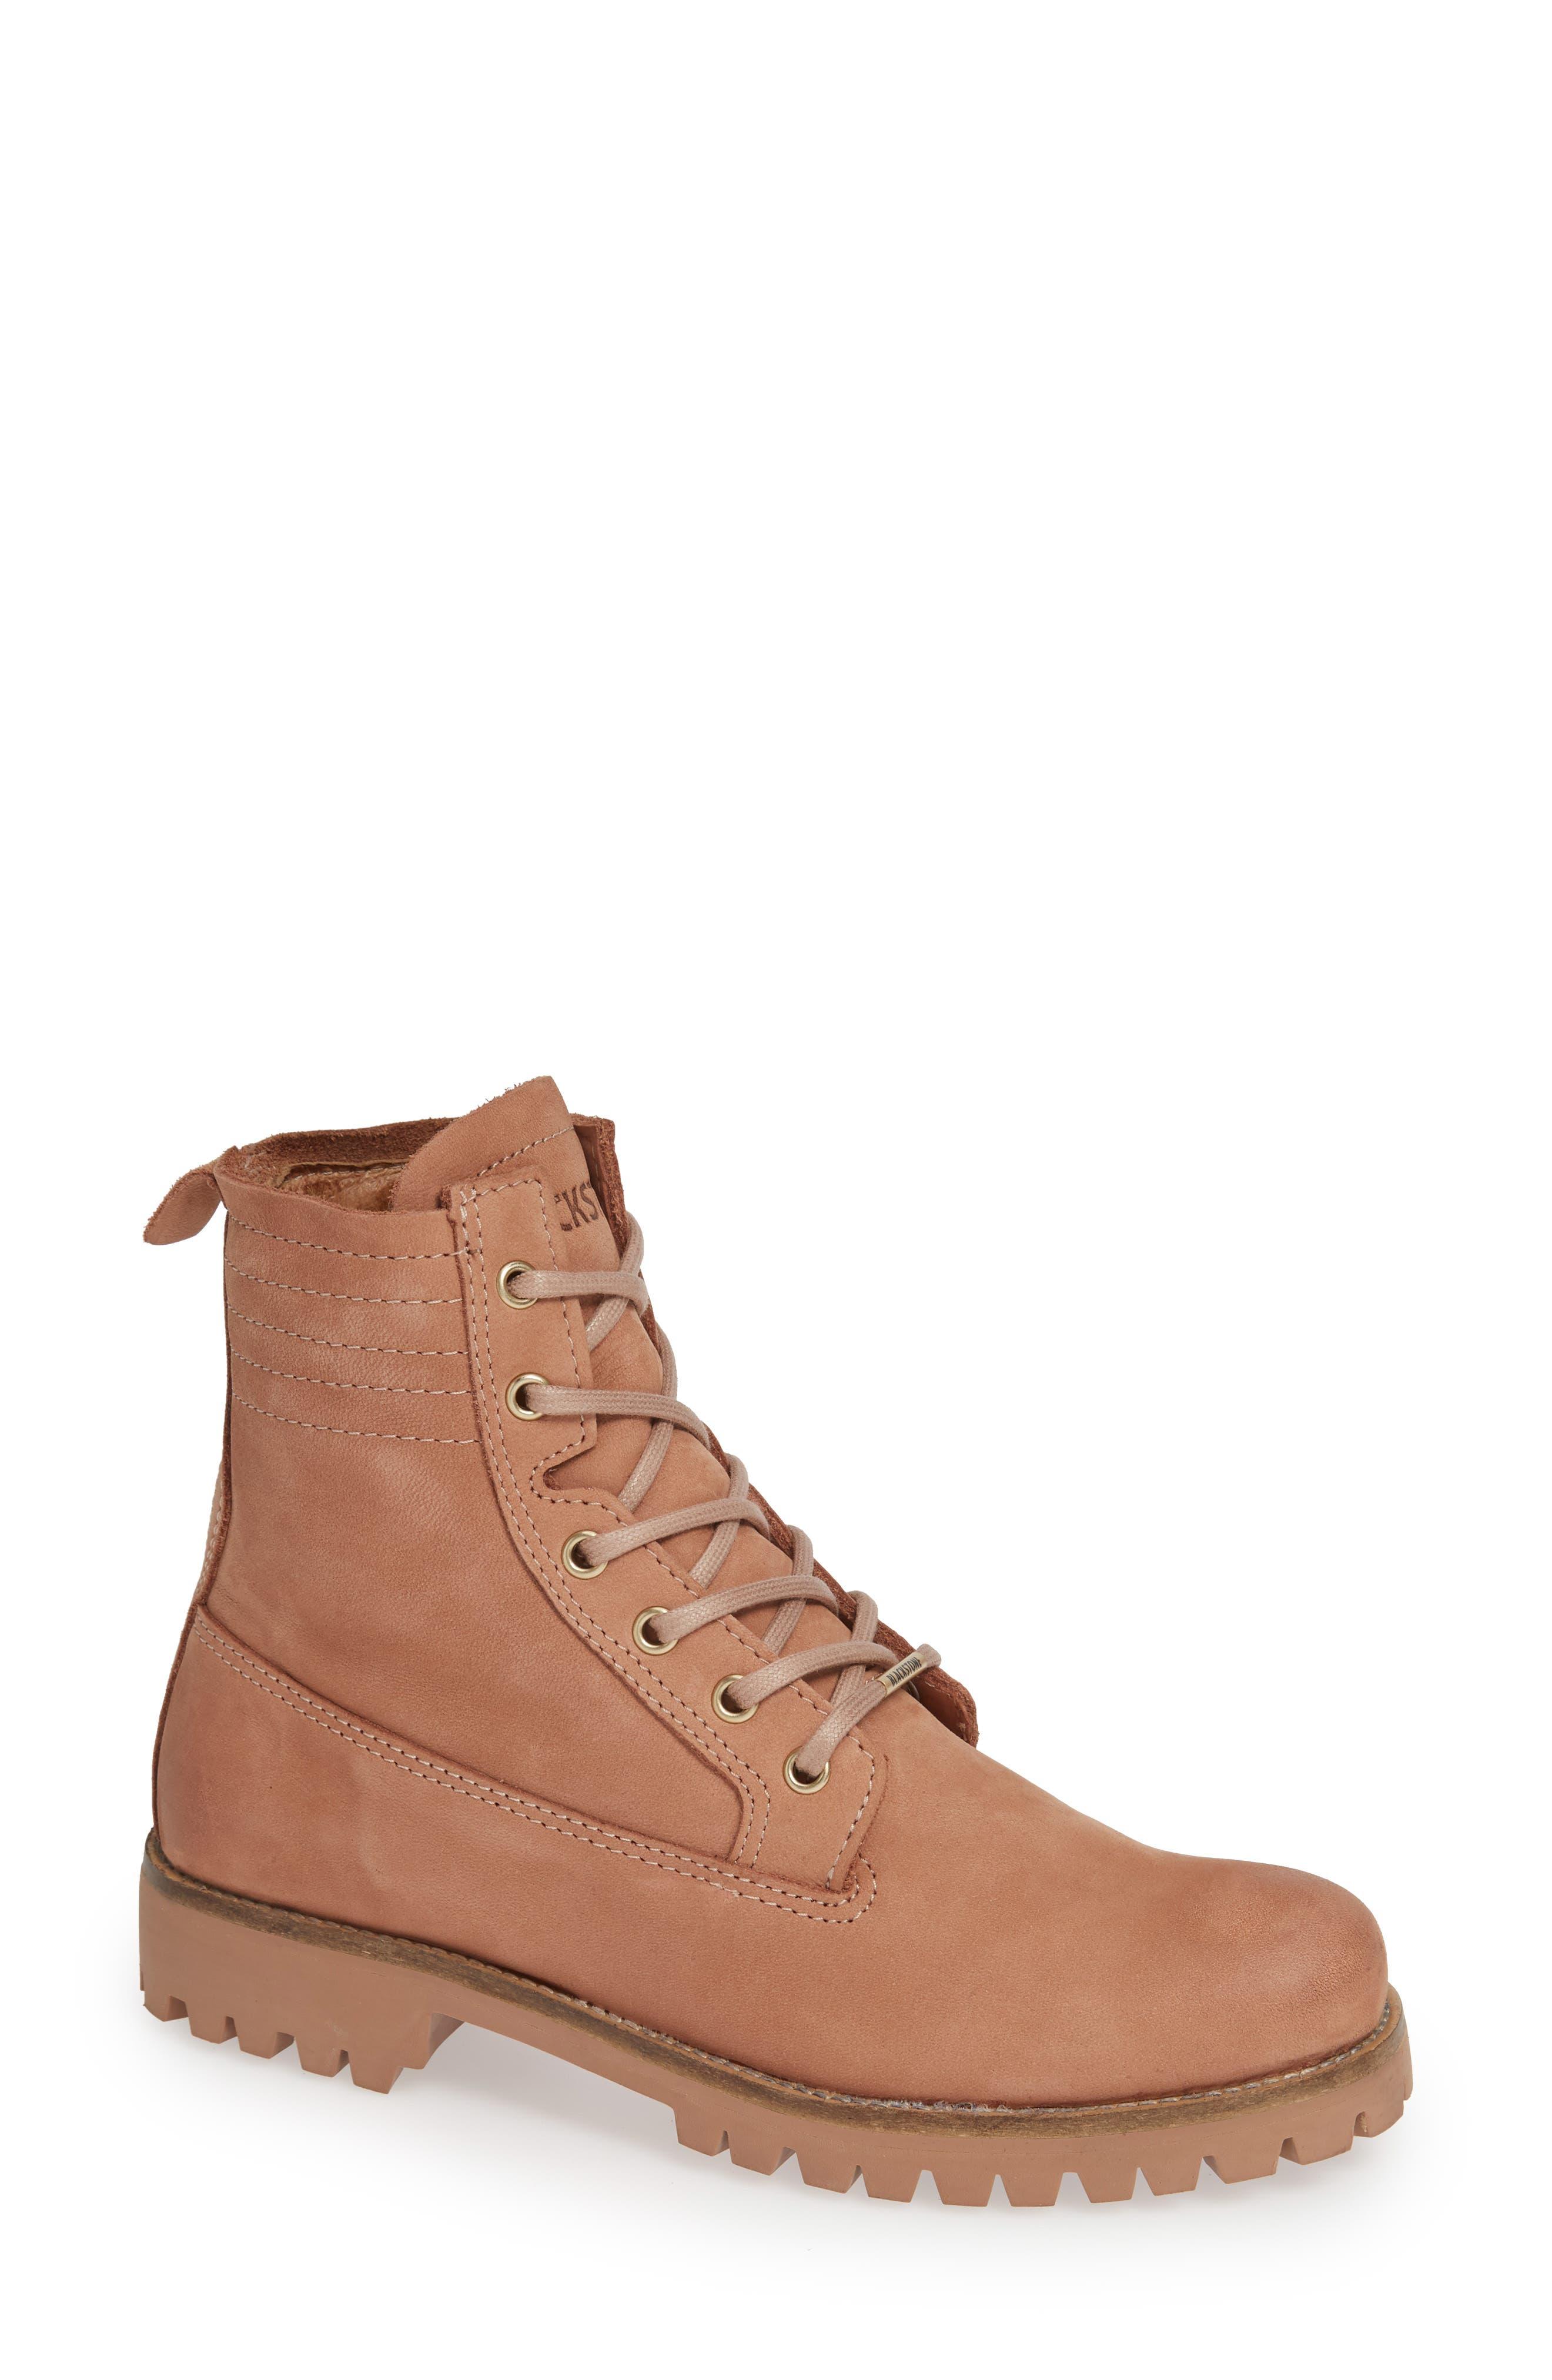 Blackstone Ol23 Lace-Up Boot, Beige